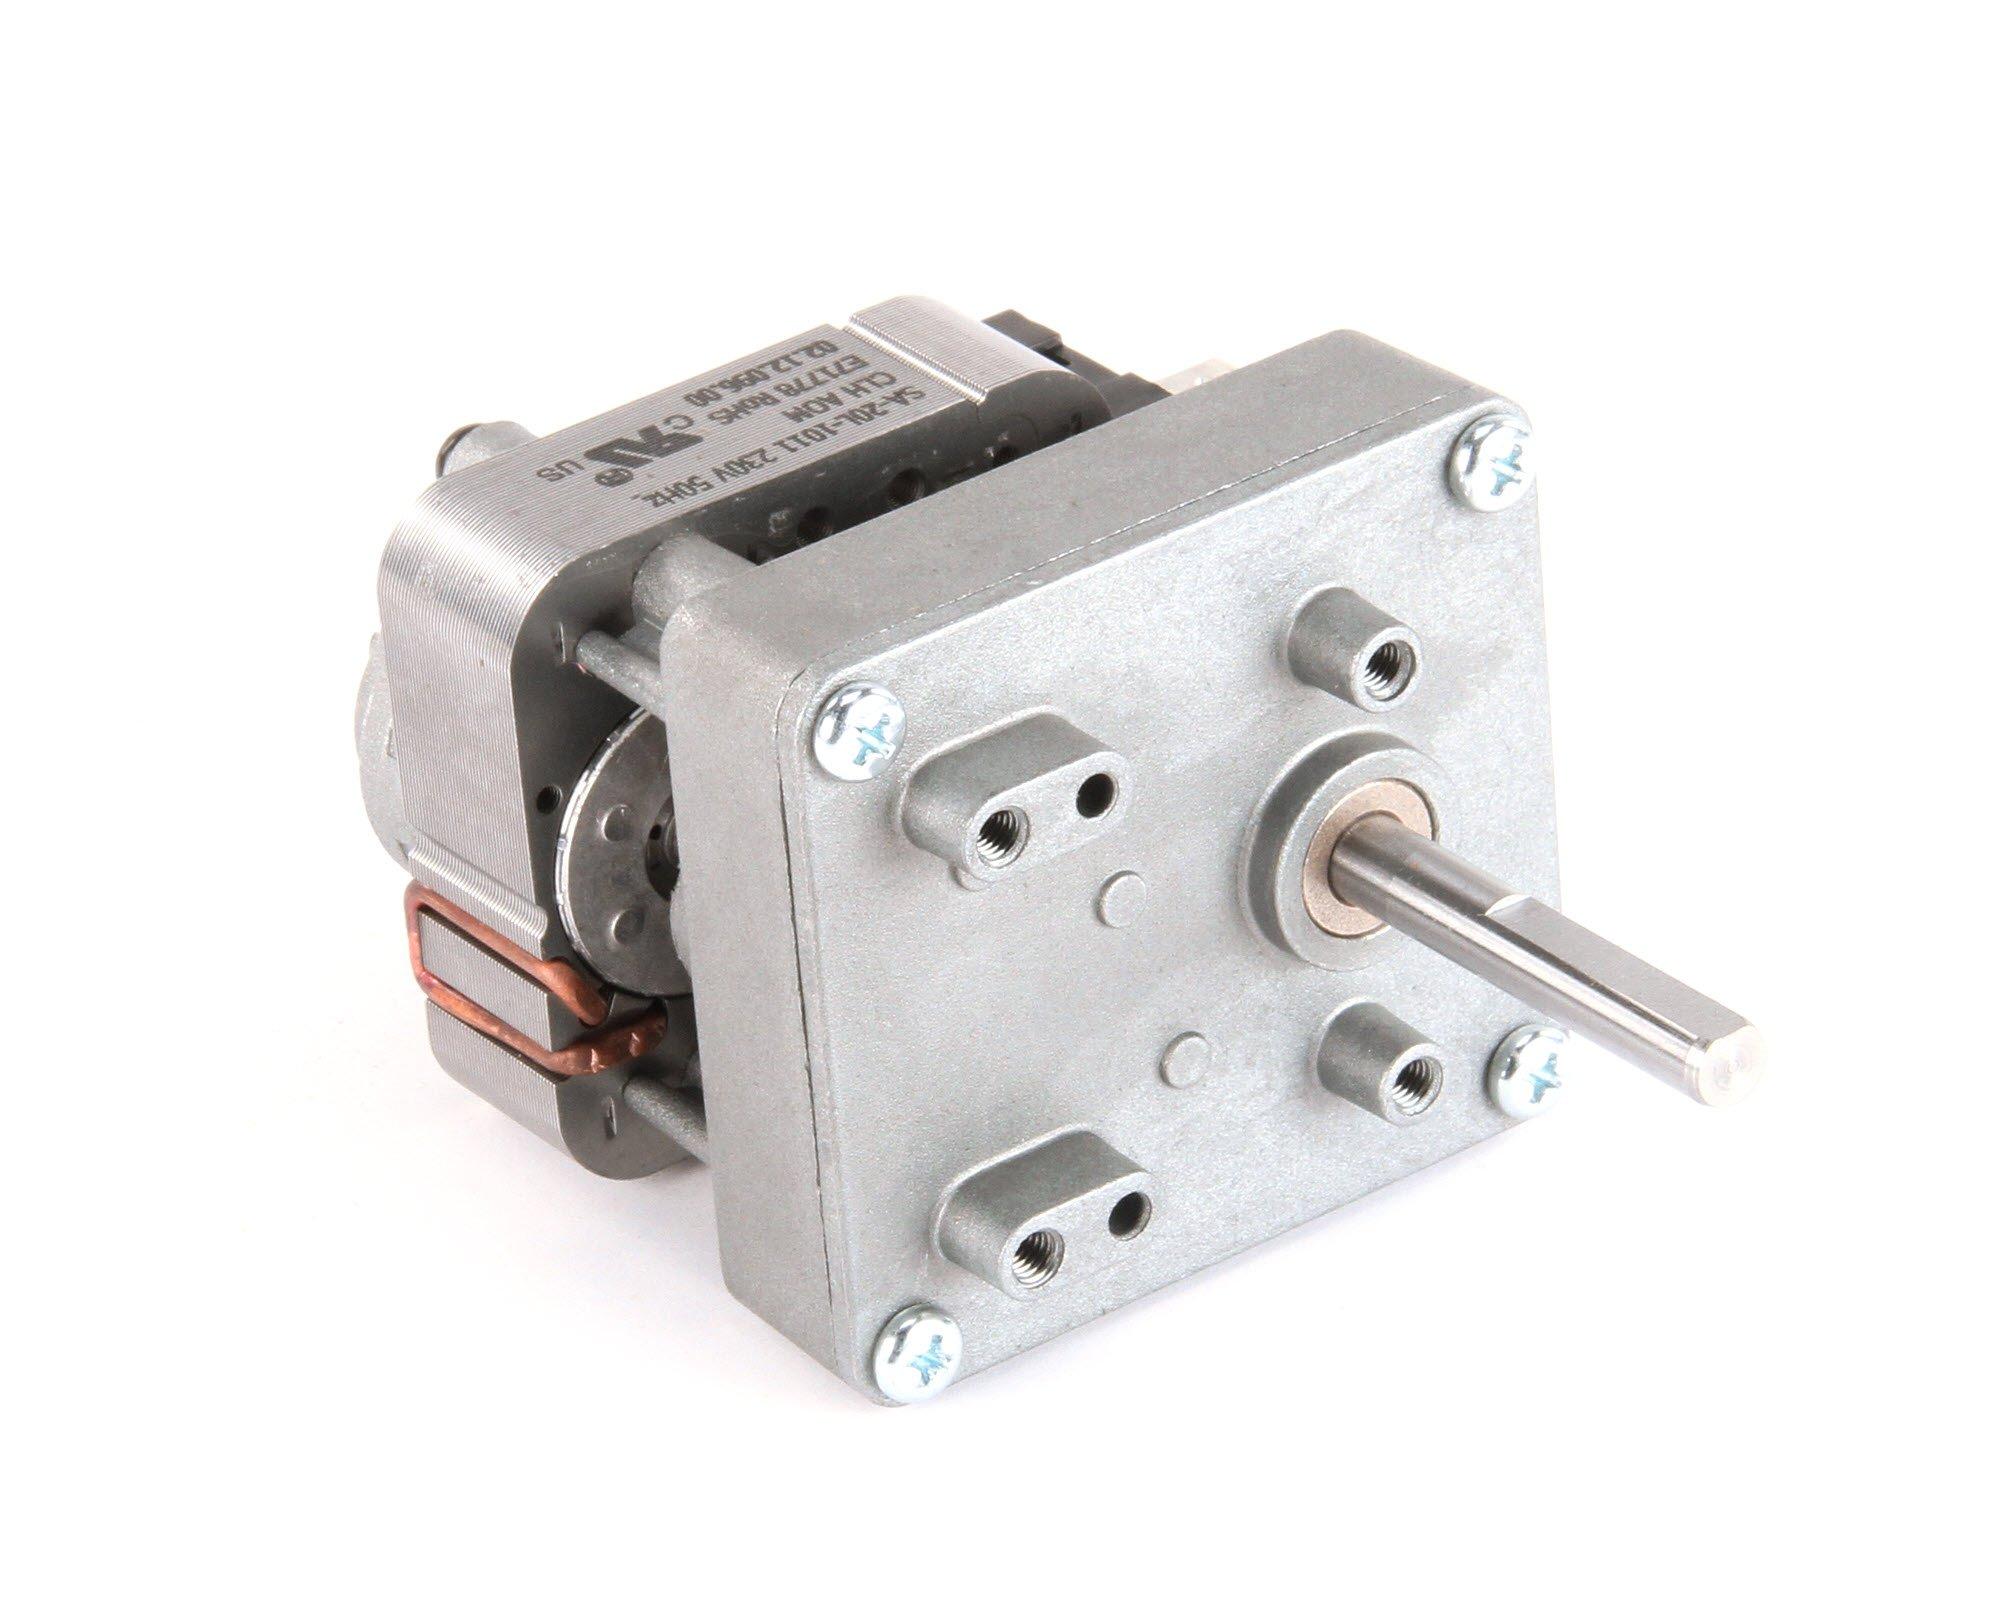 Hatco 02.12.096.00 02-12-096 Motor Gear 230V 50 Hz 11 rpm Ccl